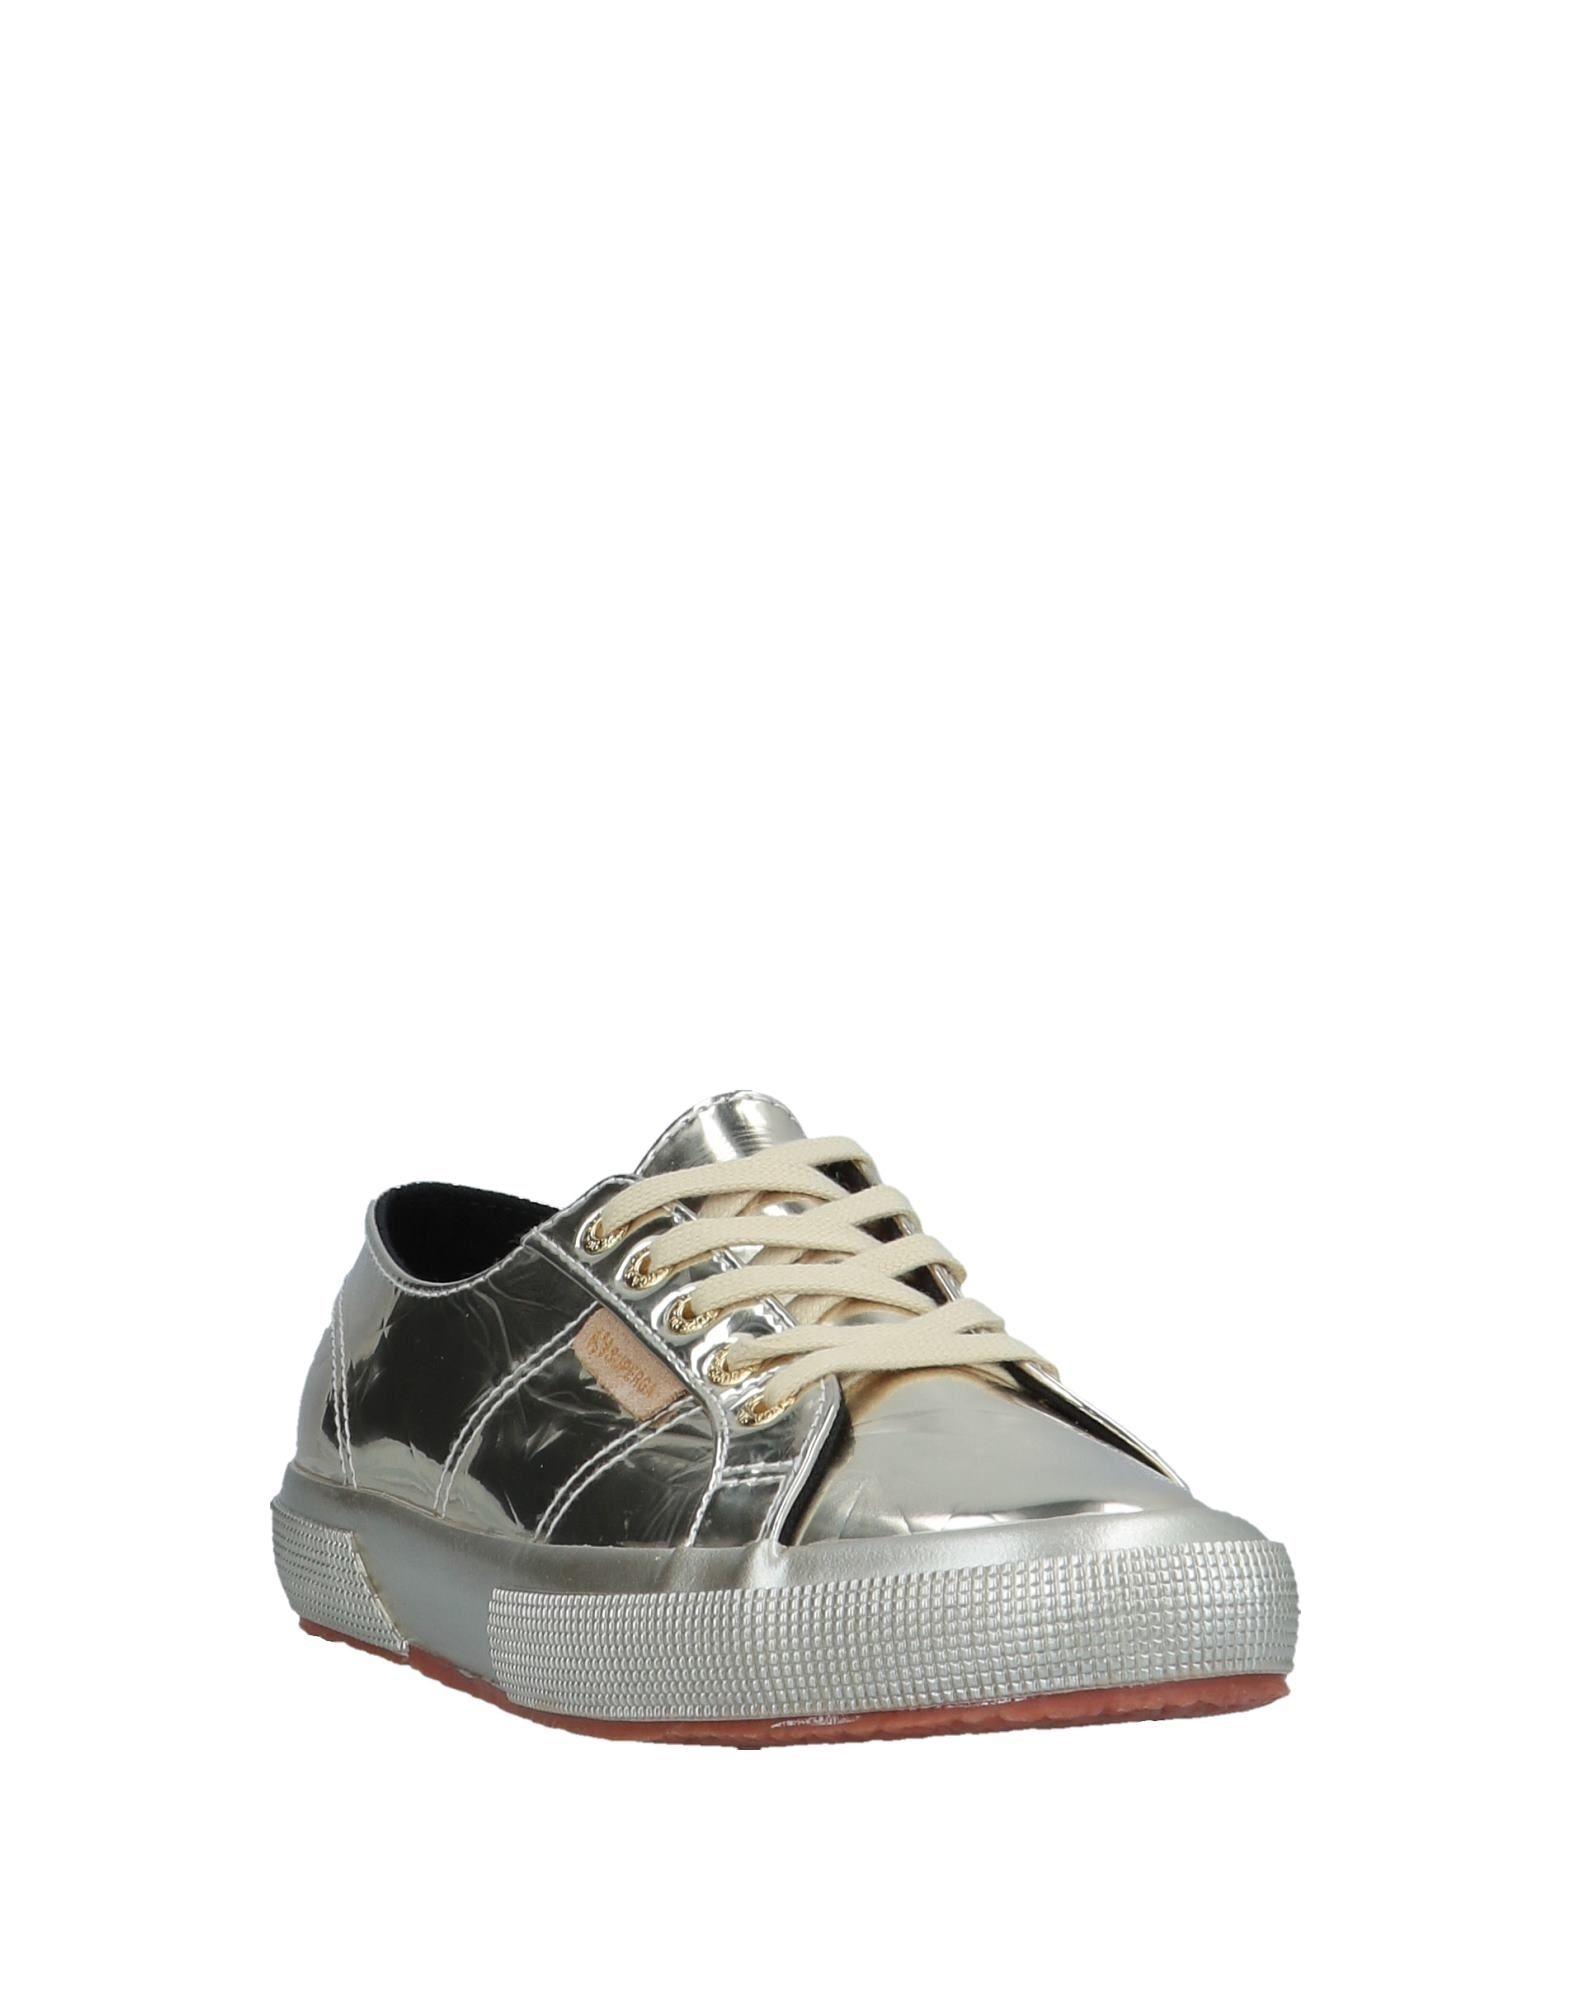 Superga® Sneakers Damen  beliebte 11571108UW Gute Qualität beliebte  Schuhe 0dfe82